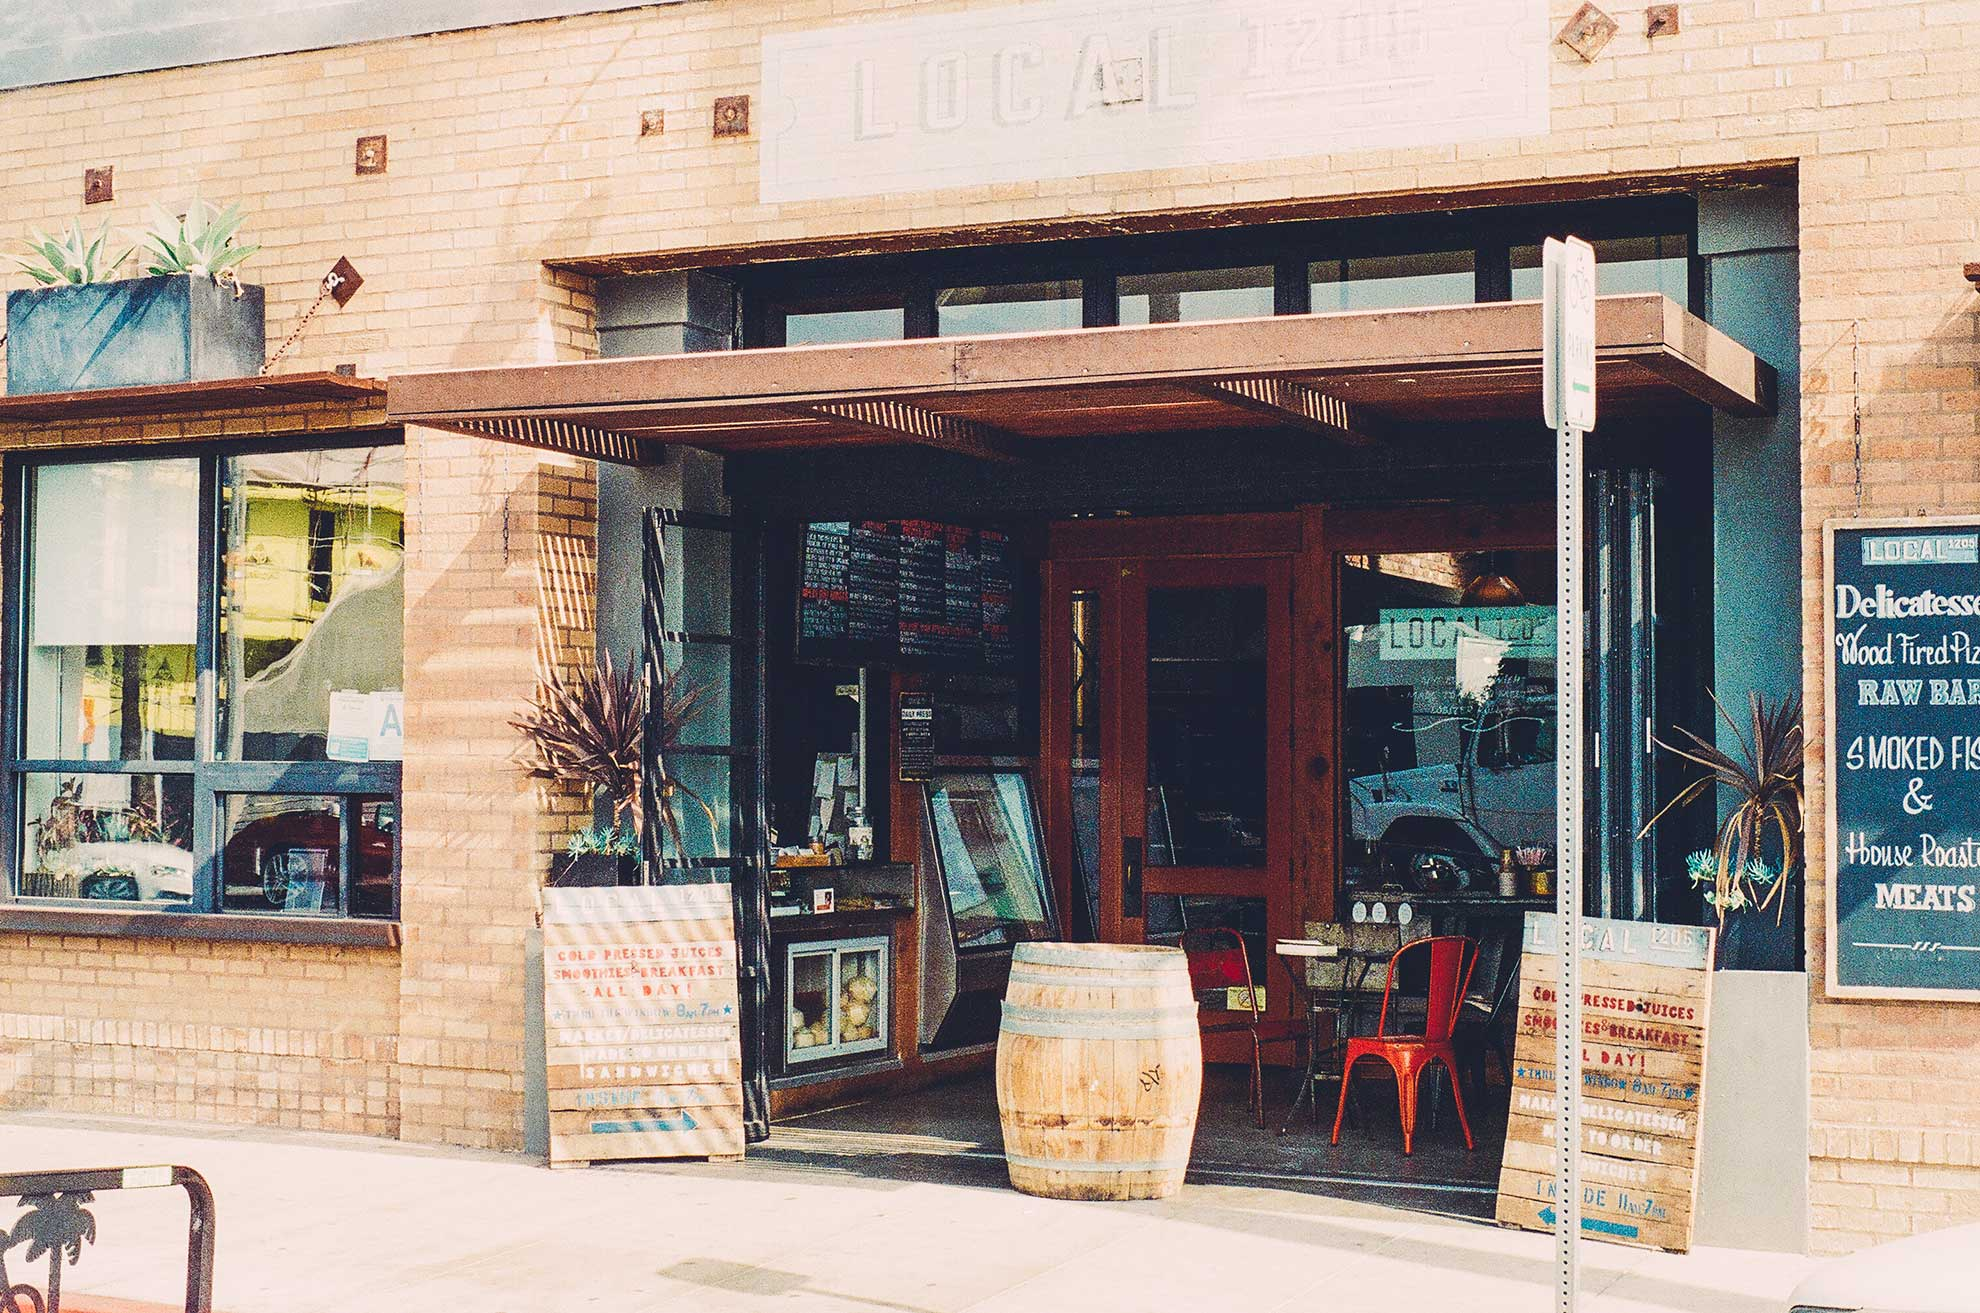 Restaurant shop front